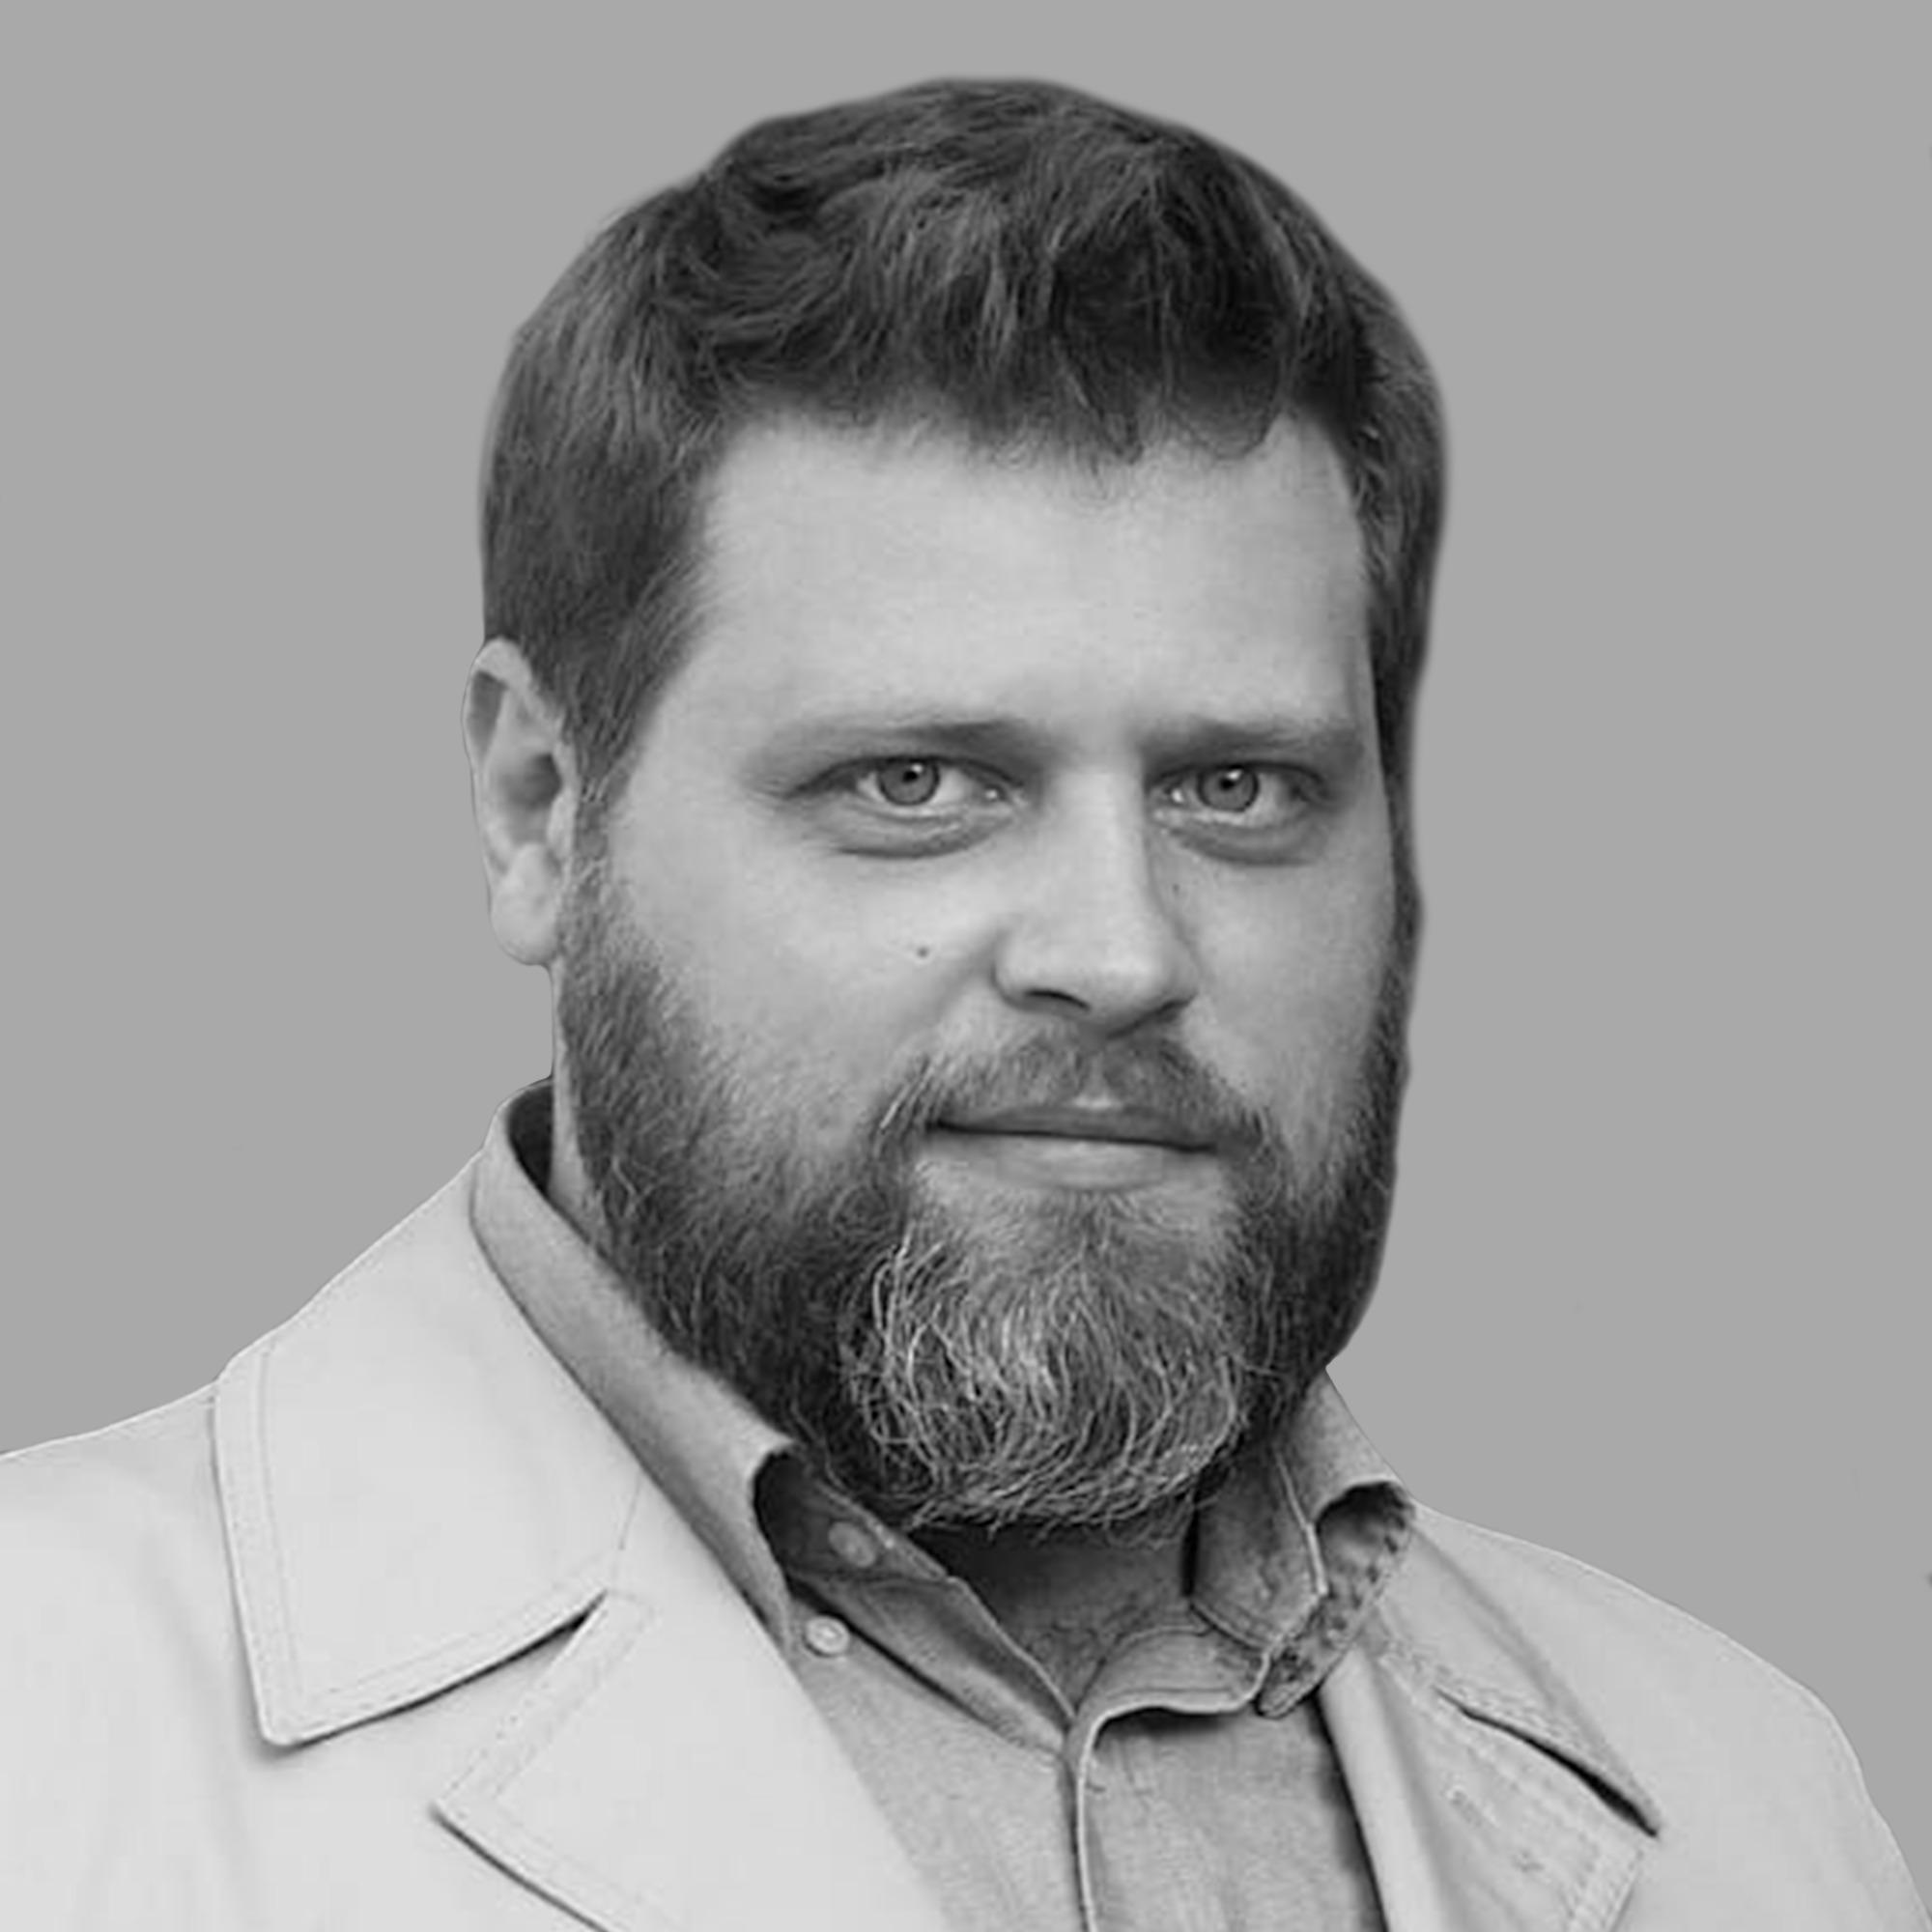 Николай Тимченко